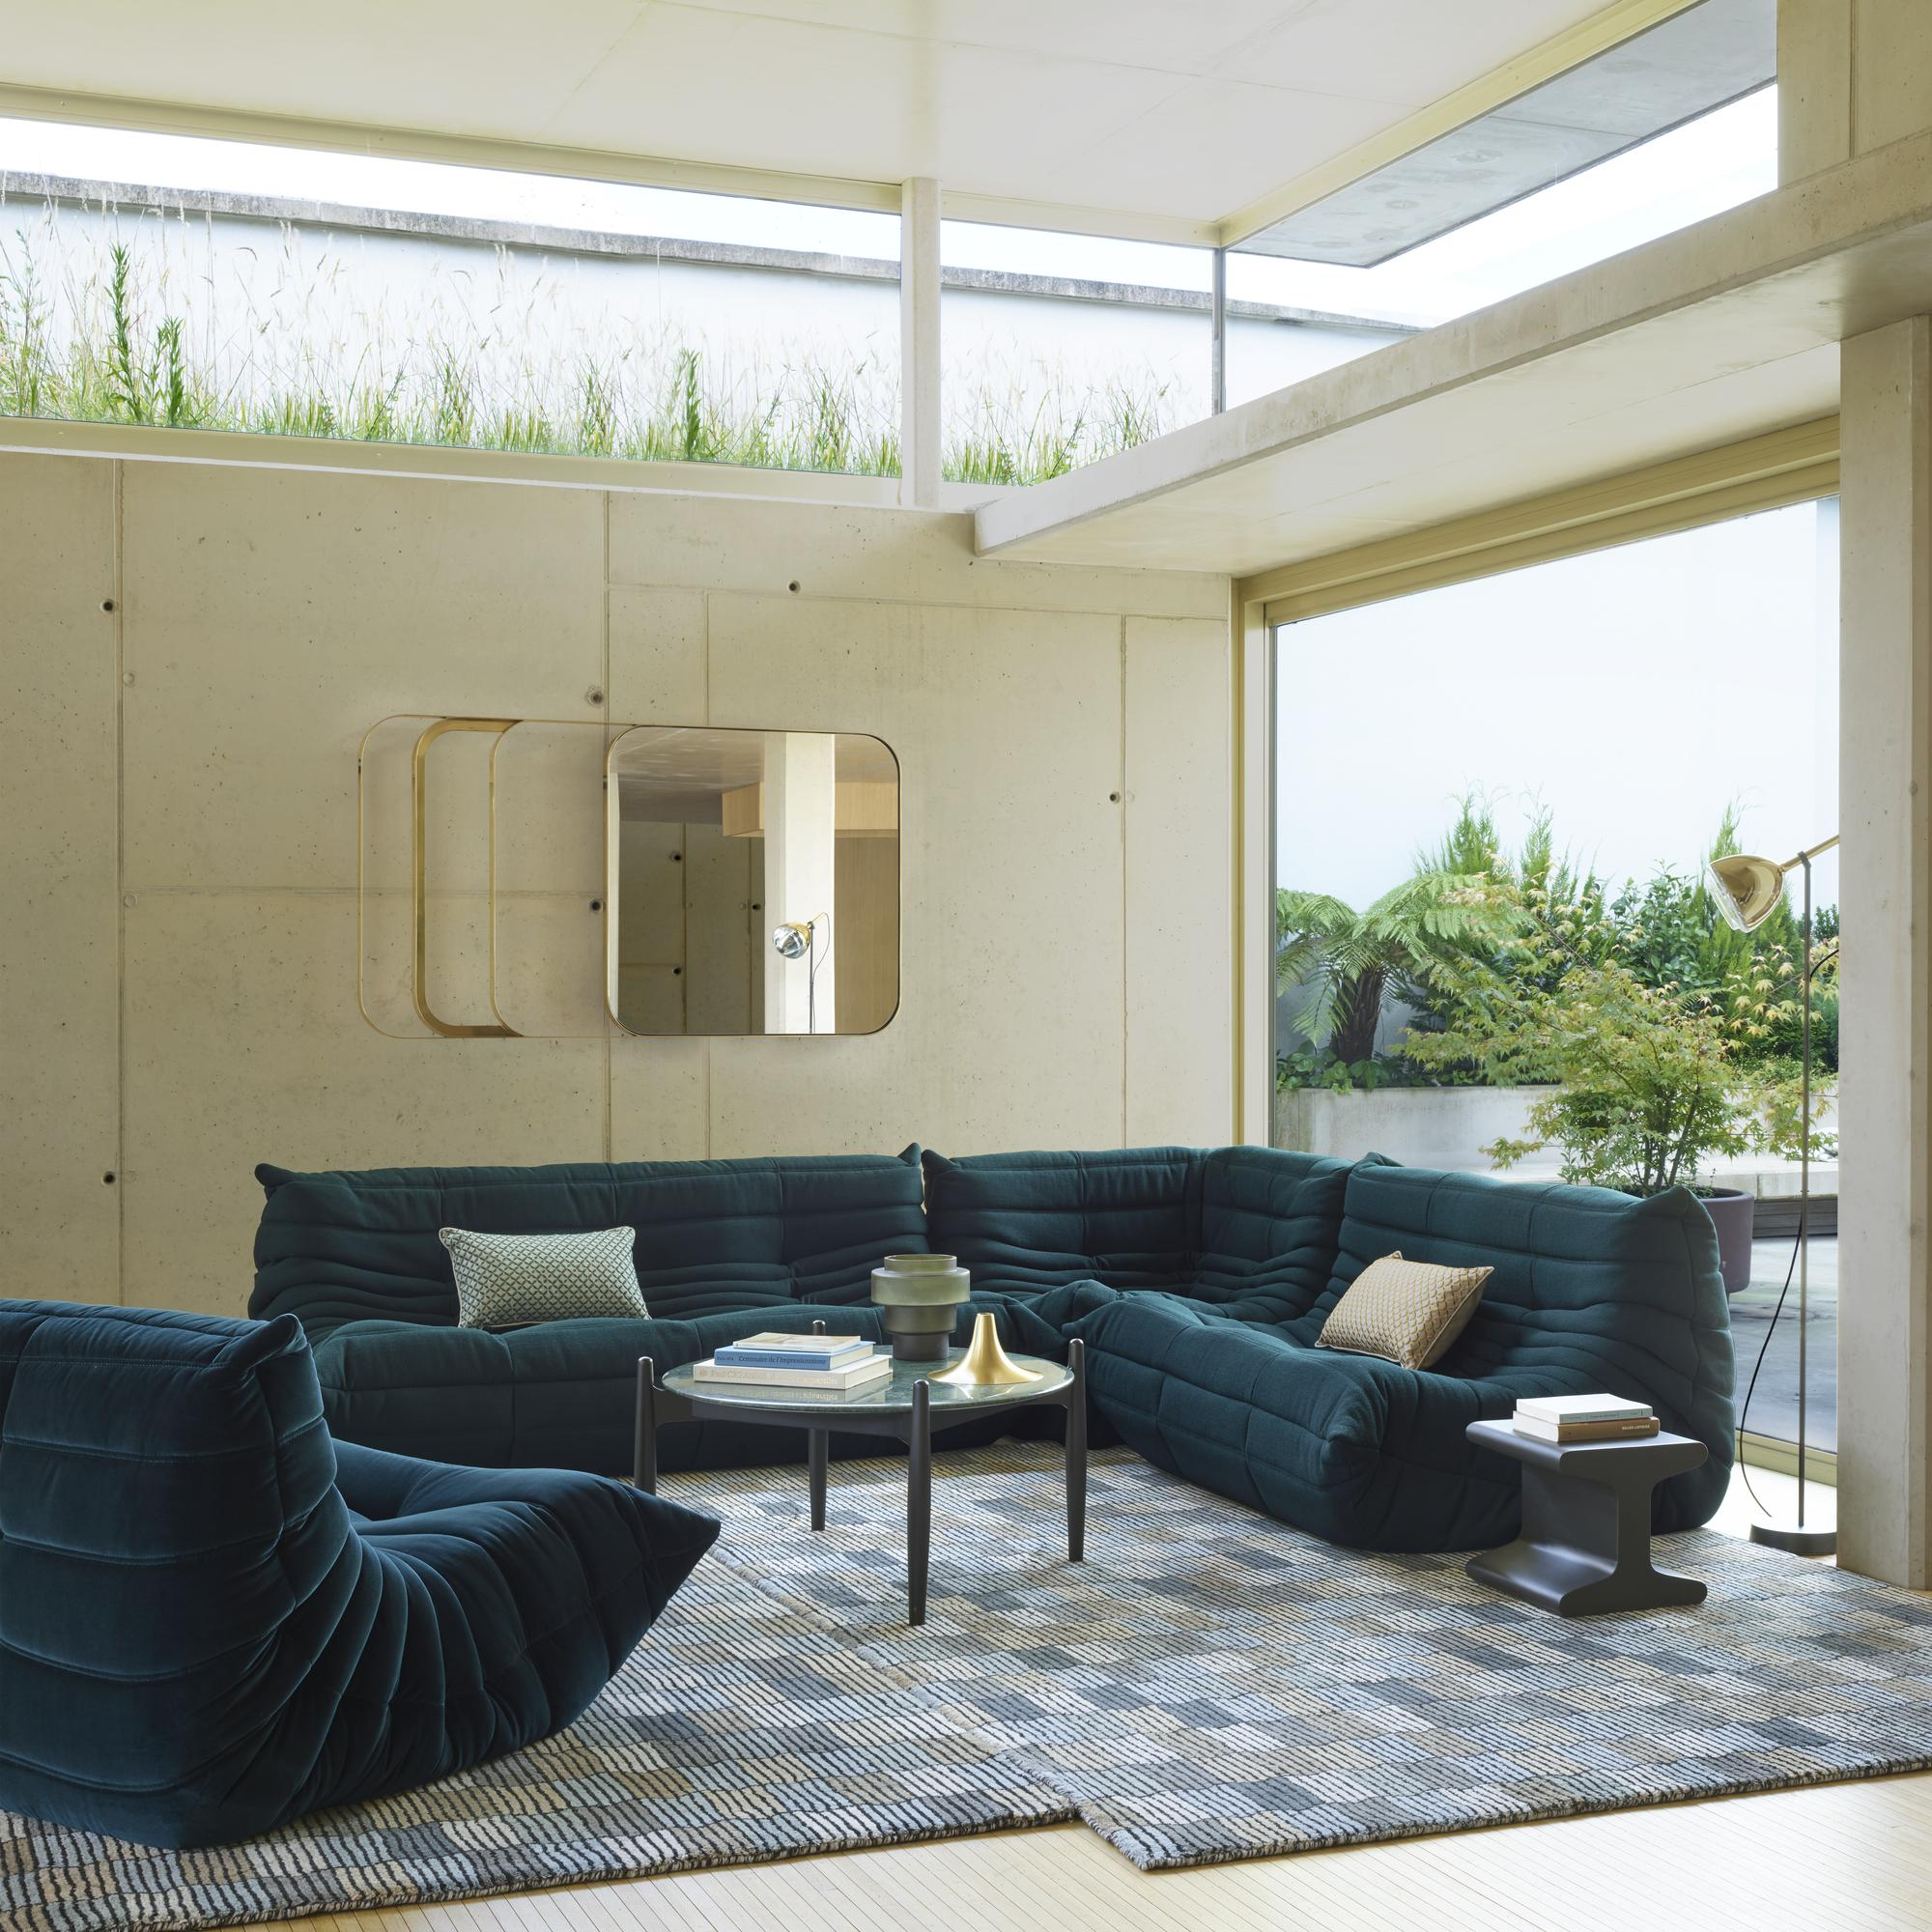 Full Size of Ligne Roset Togo Sessel Gebraucht Farben Reproduction For Sale Canada Sofa Ireland Wohnzimmer Ligne Roset Togo